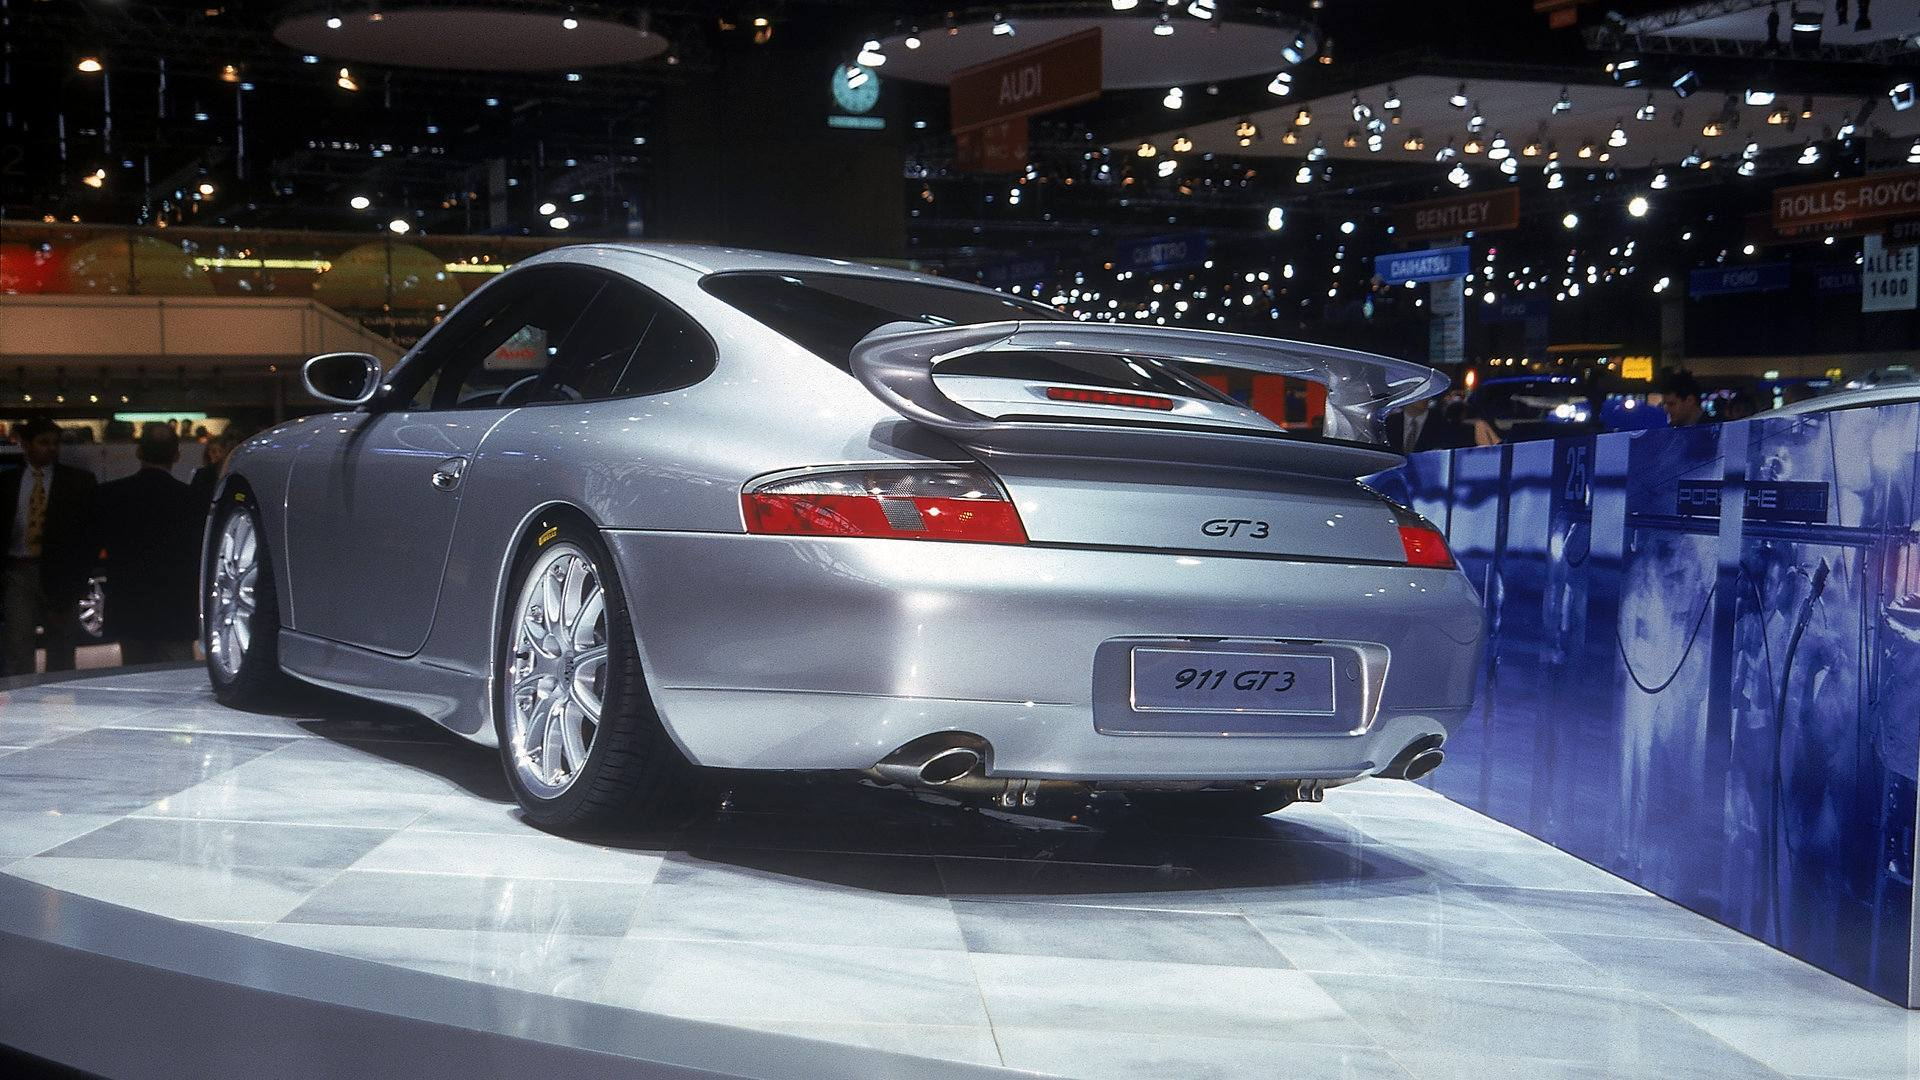 Porsche 911 GT3 996 Salon Ginebra 1999